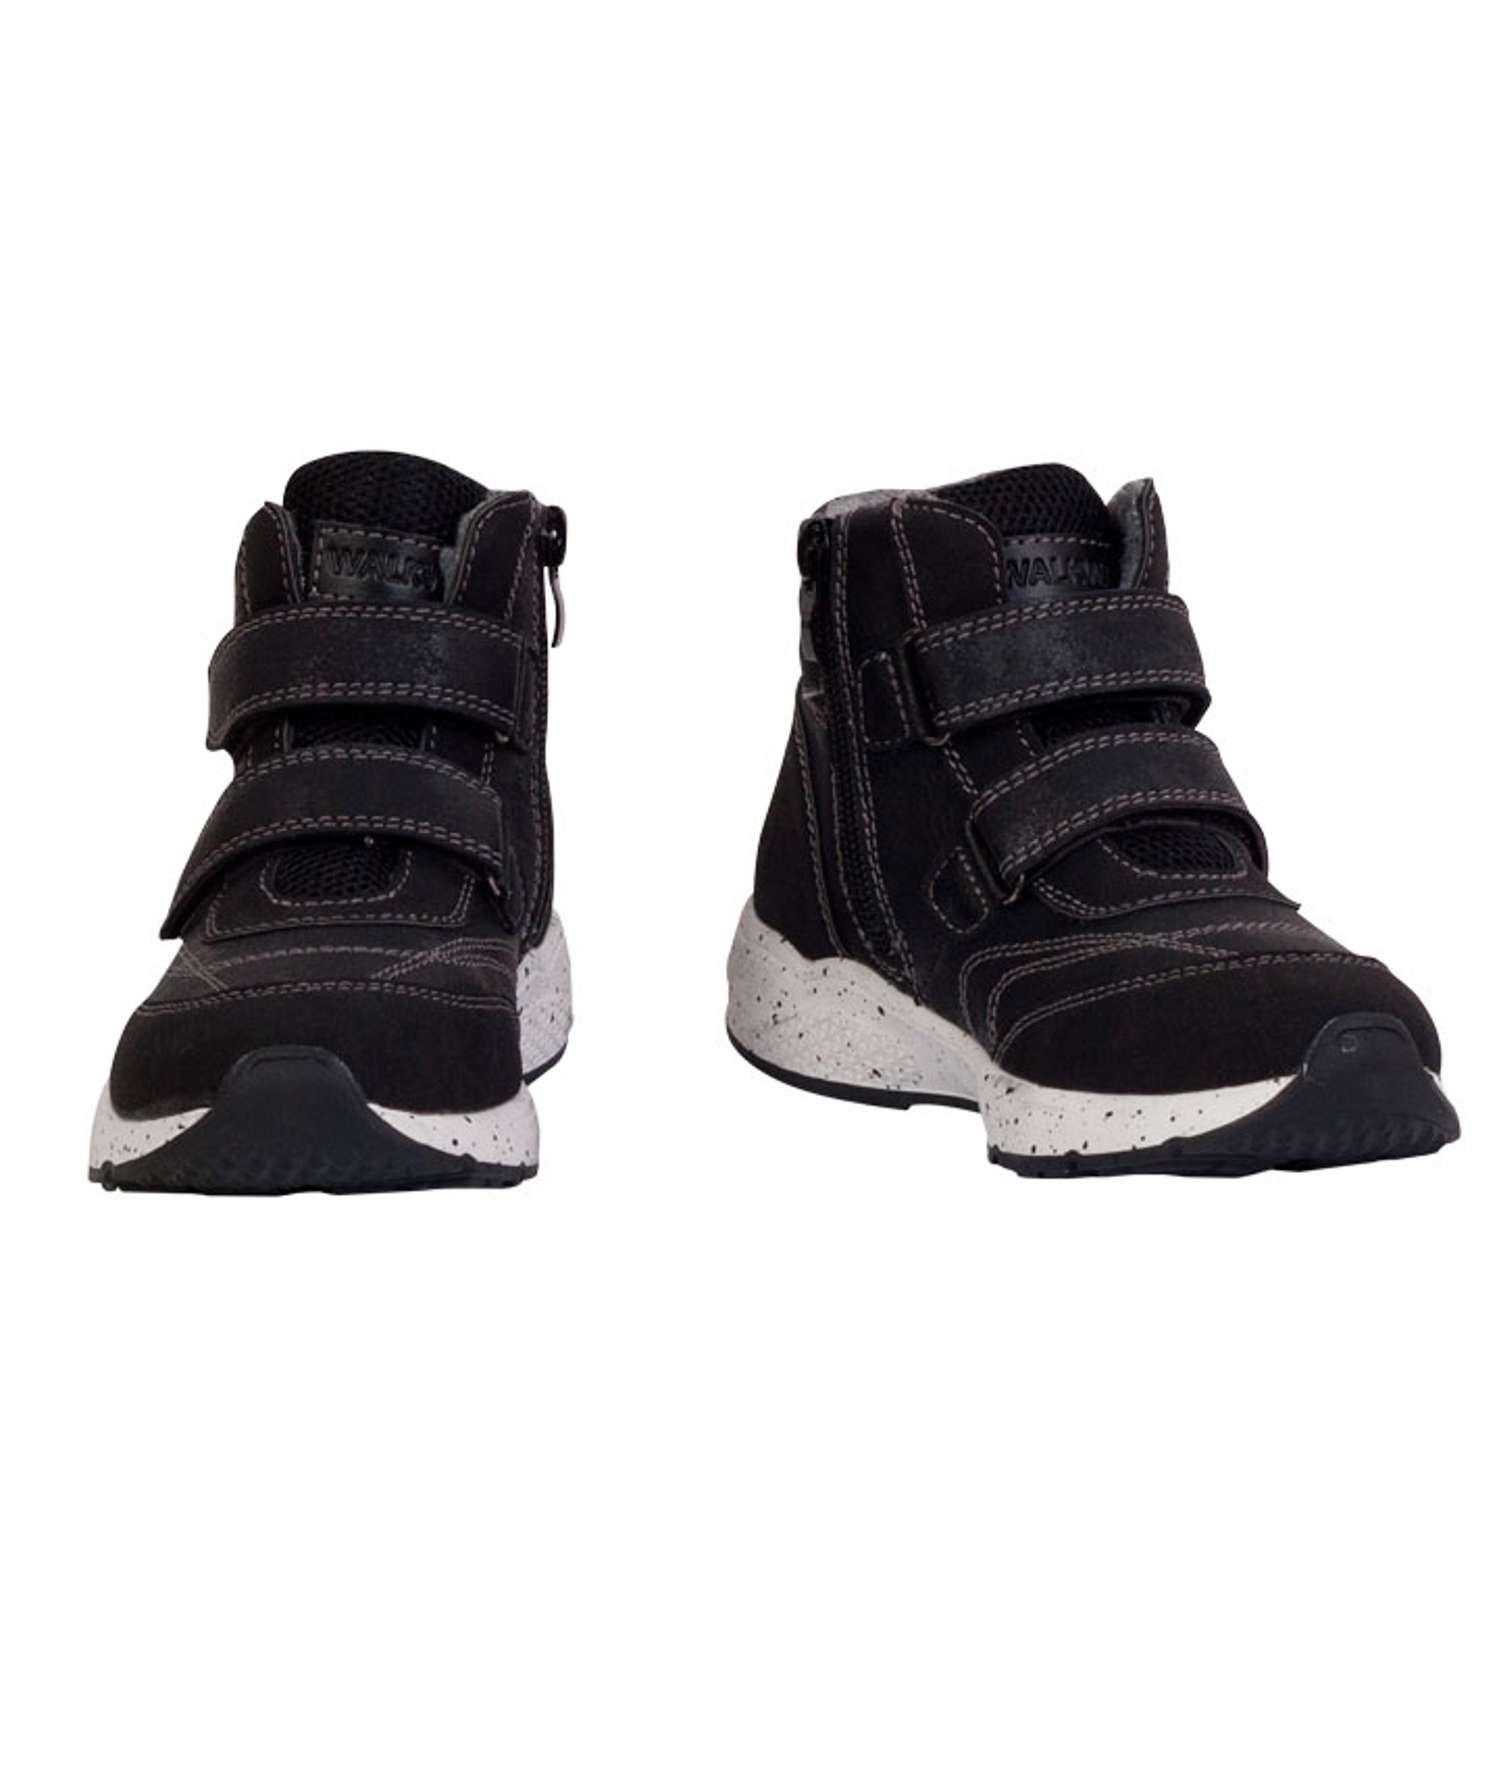 Walkway - Akako børne vinter sneakers - Sort - Størrelse 29